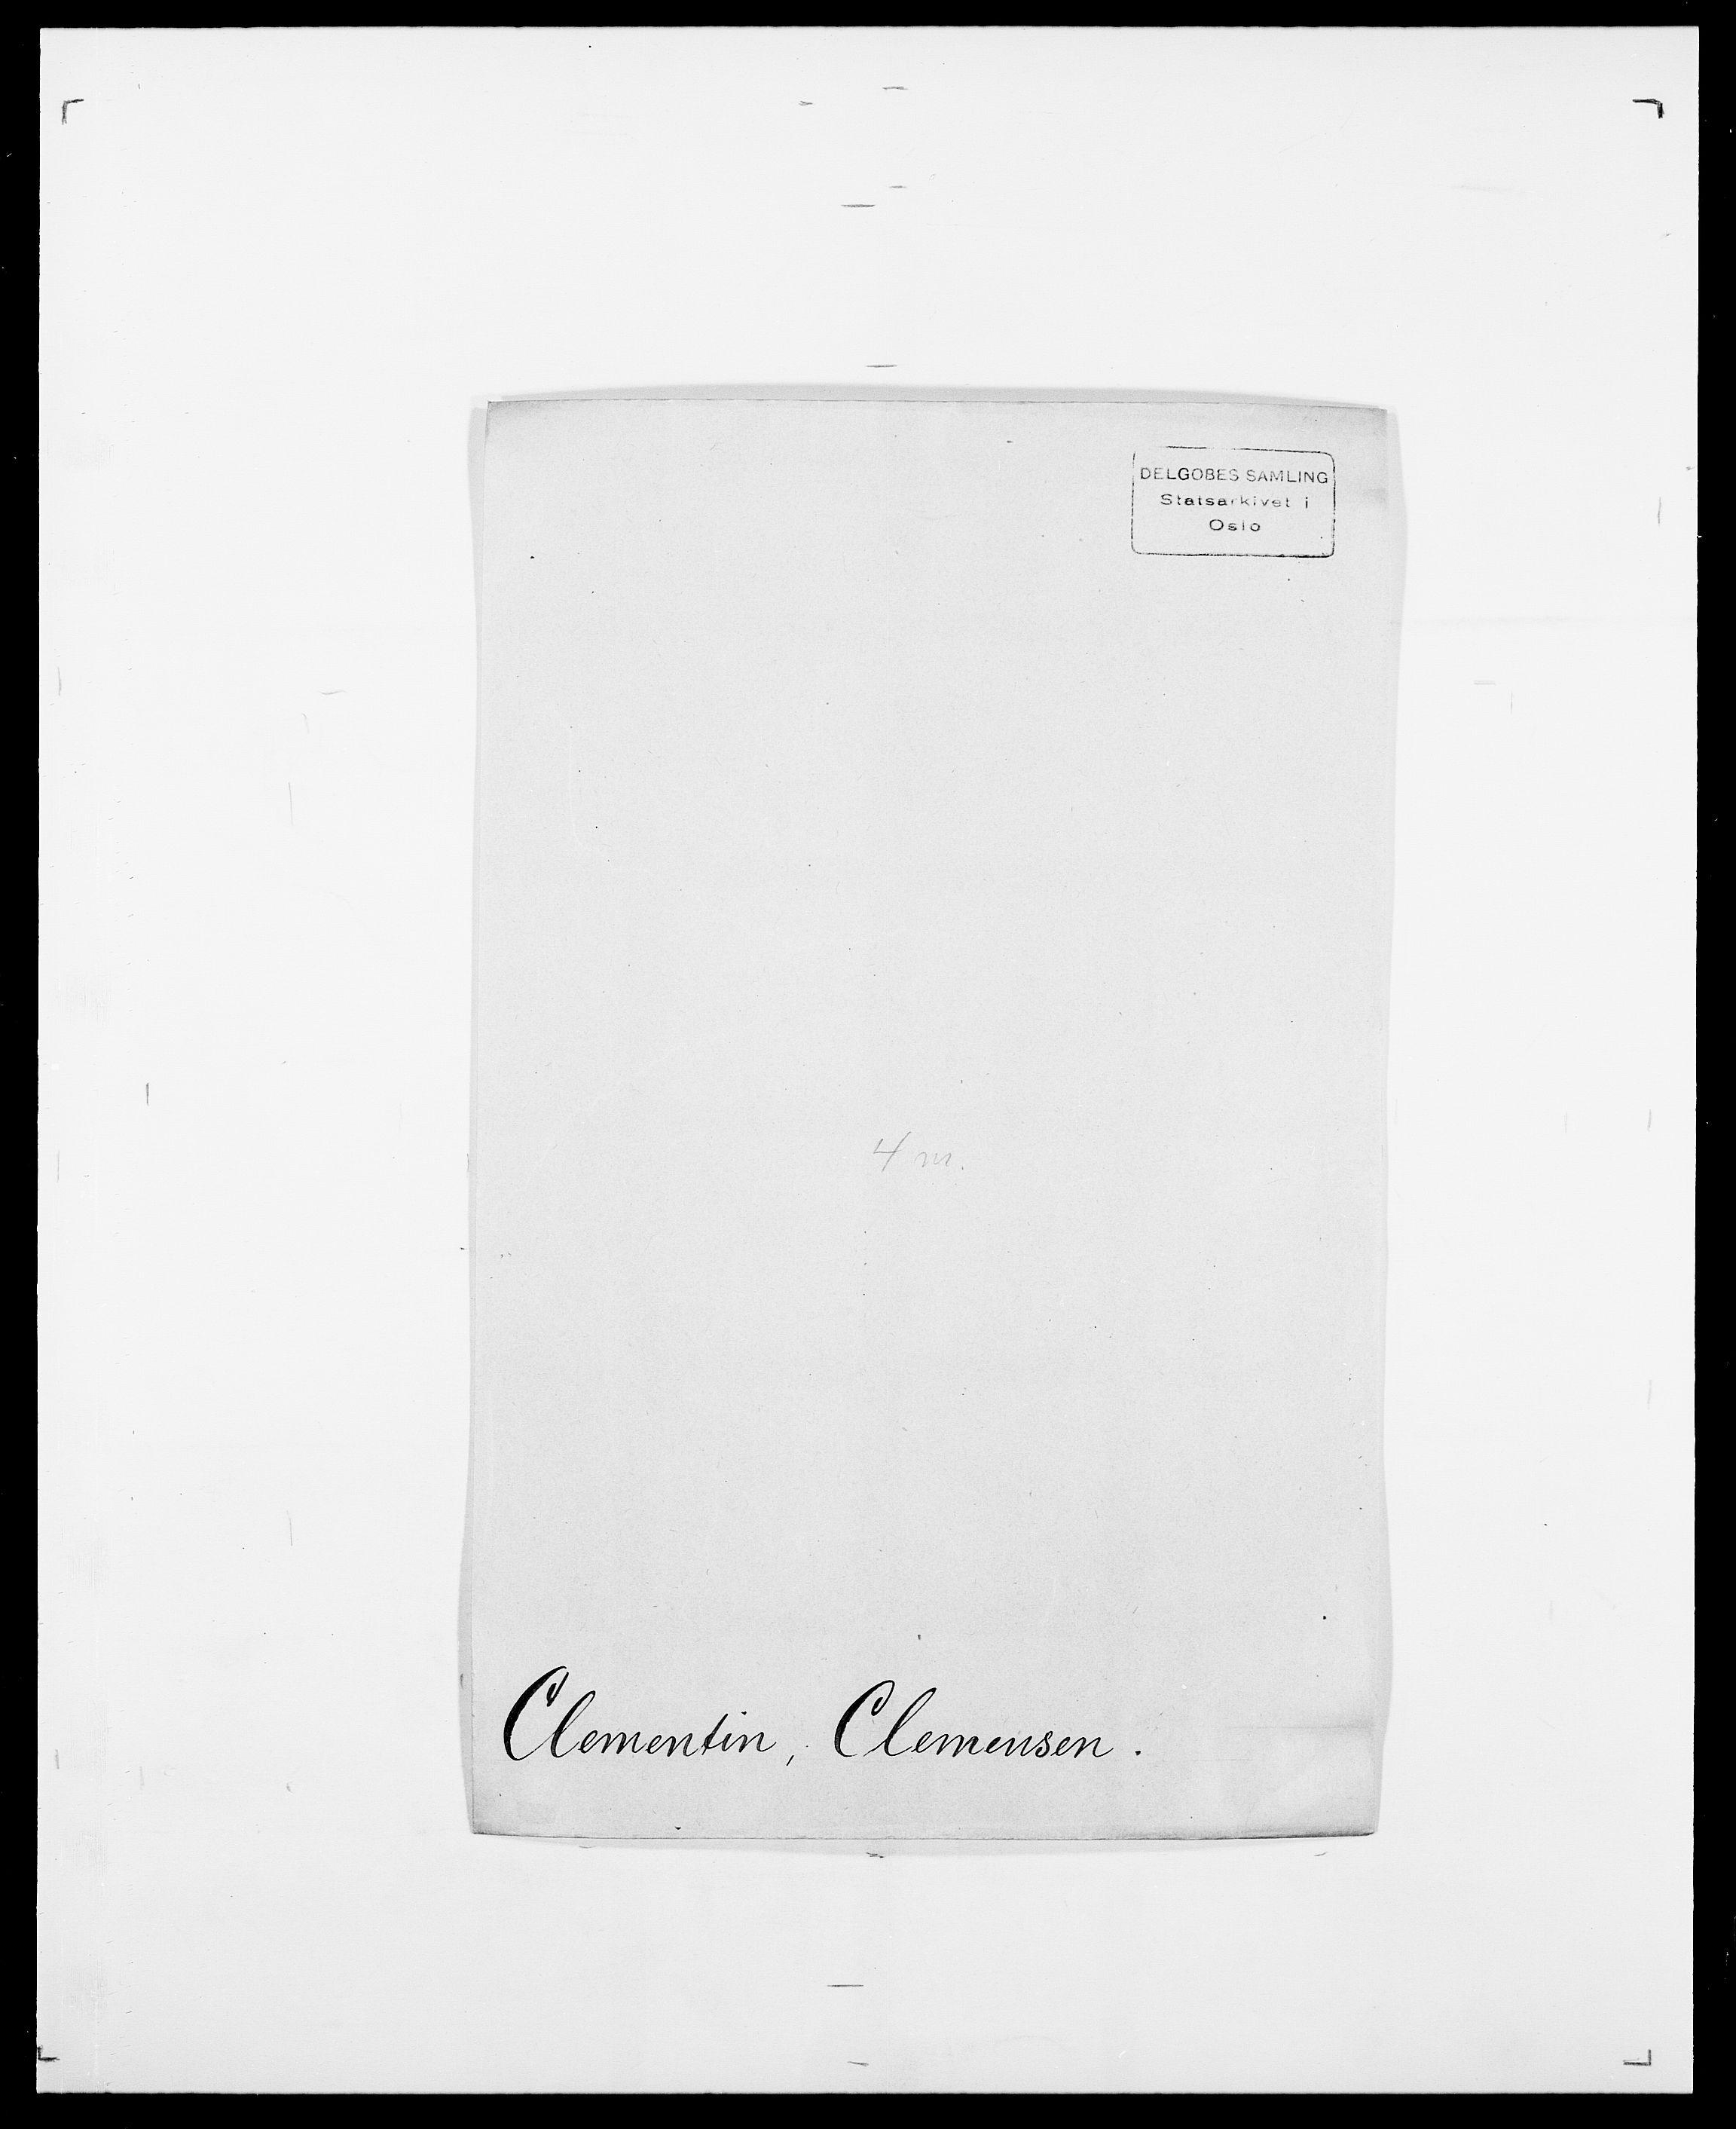 SAO, Delgobe, Charles Antoine - samling, D/Da/L0008: Capjon - Dagenbolt, s. 361